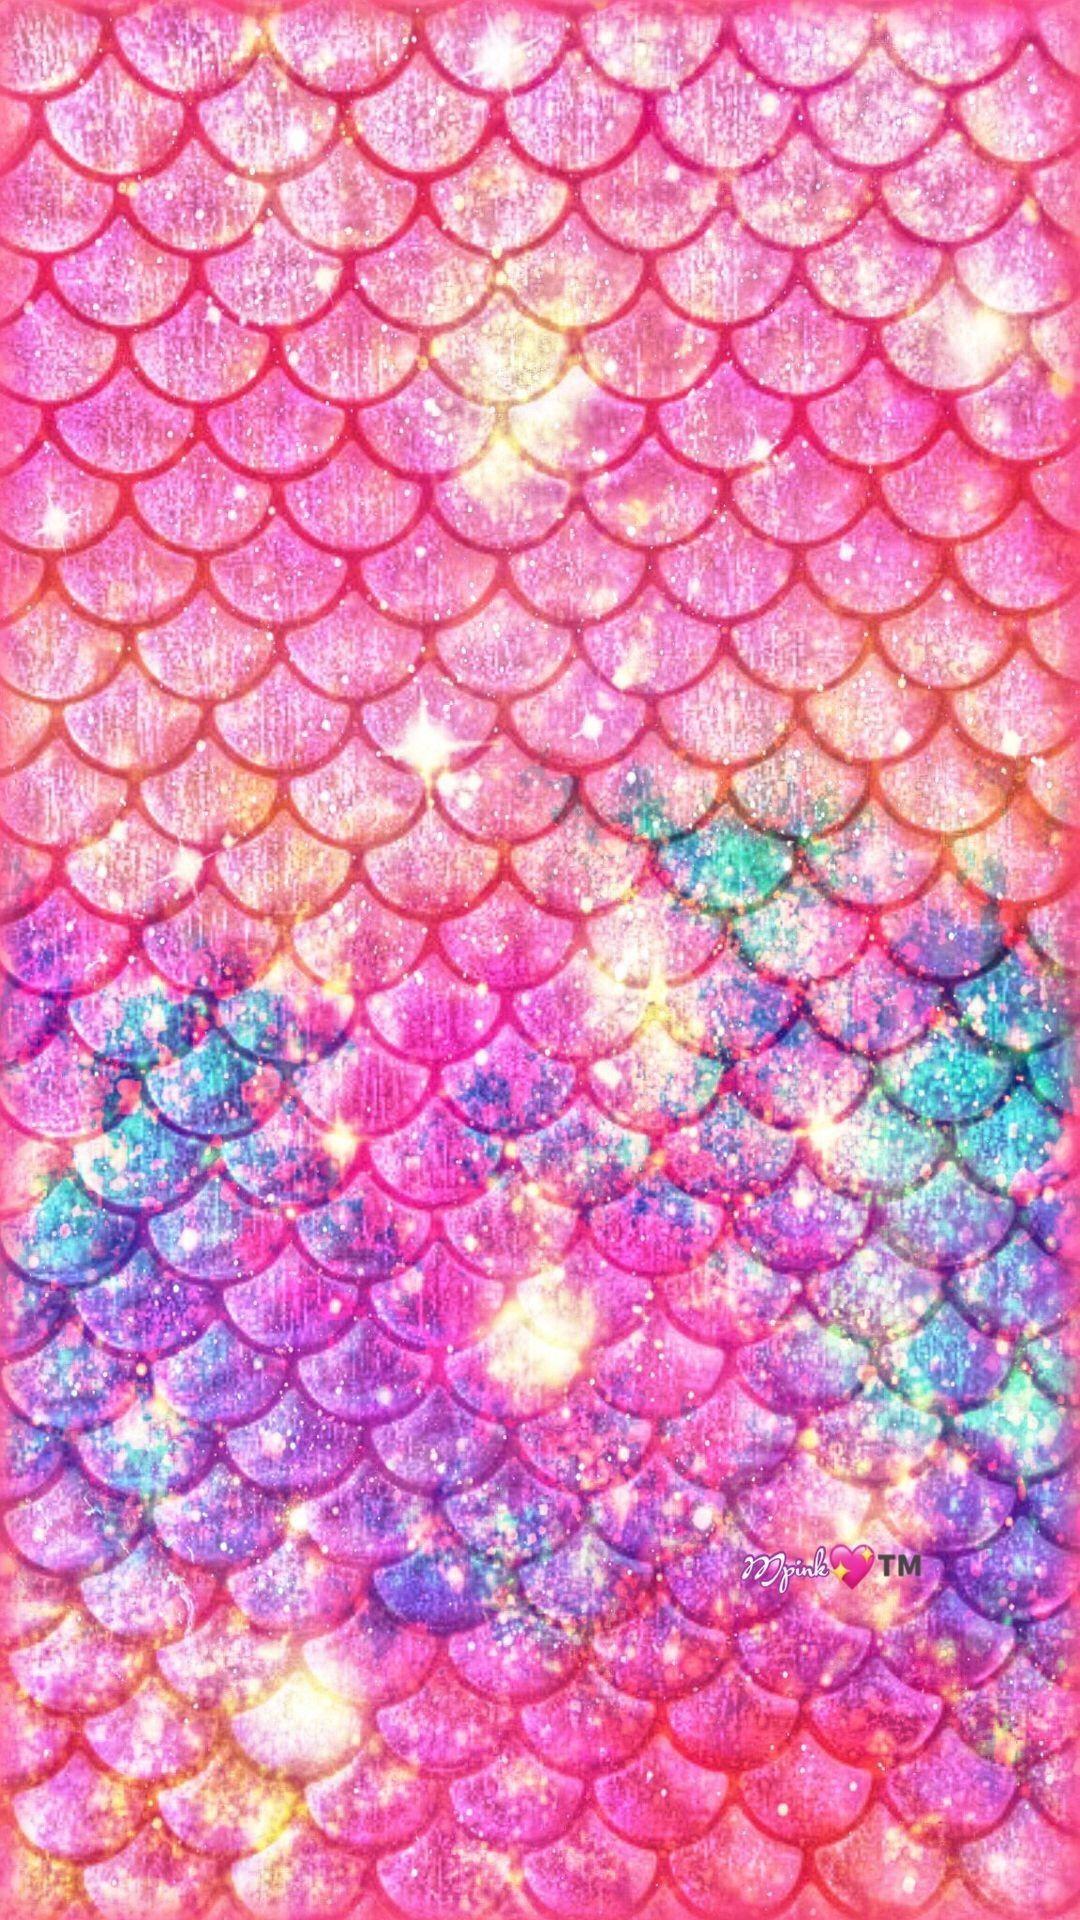 Girly Funky Hintergrund Iphone Wallpaper Pattern Mermaid Wallpapers Mermaid Wallpaper Iphone